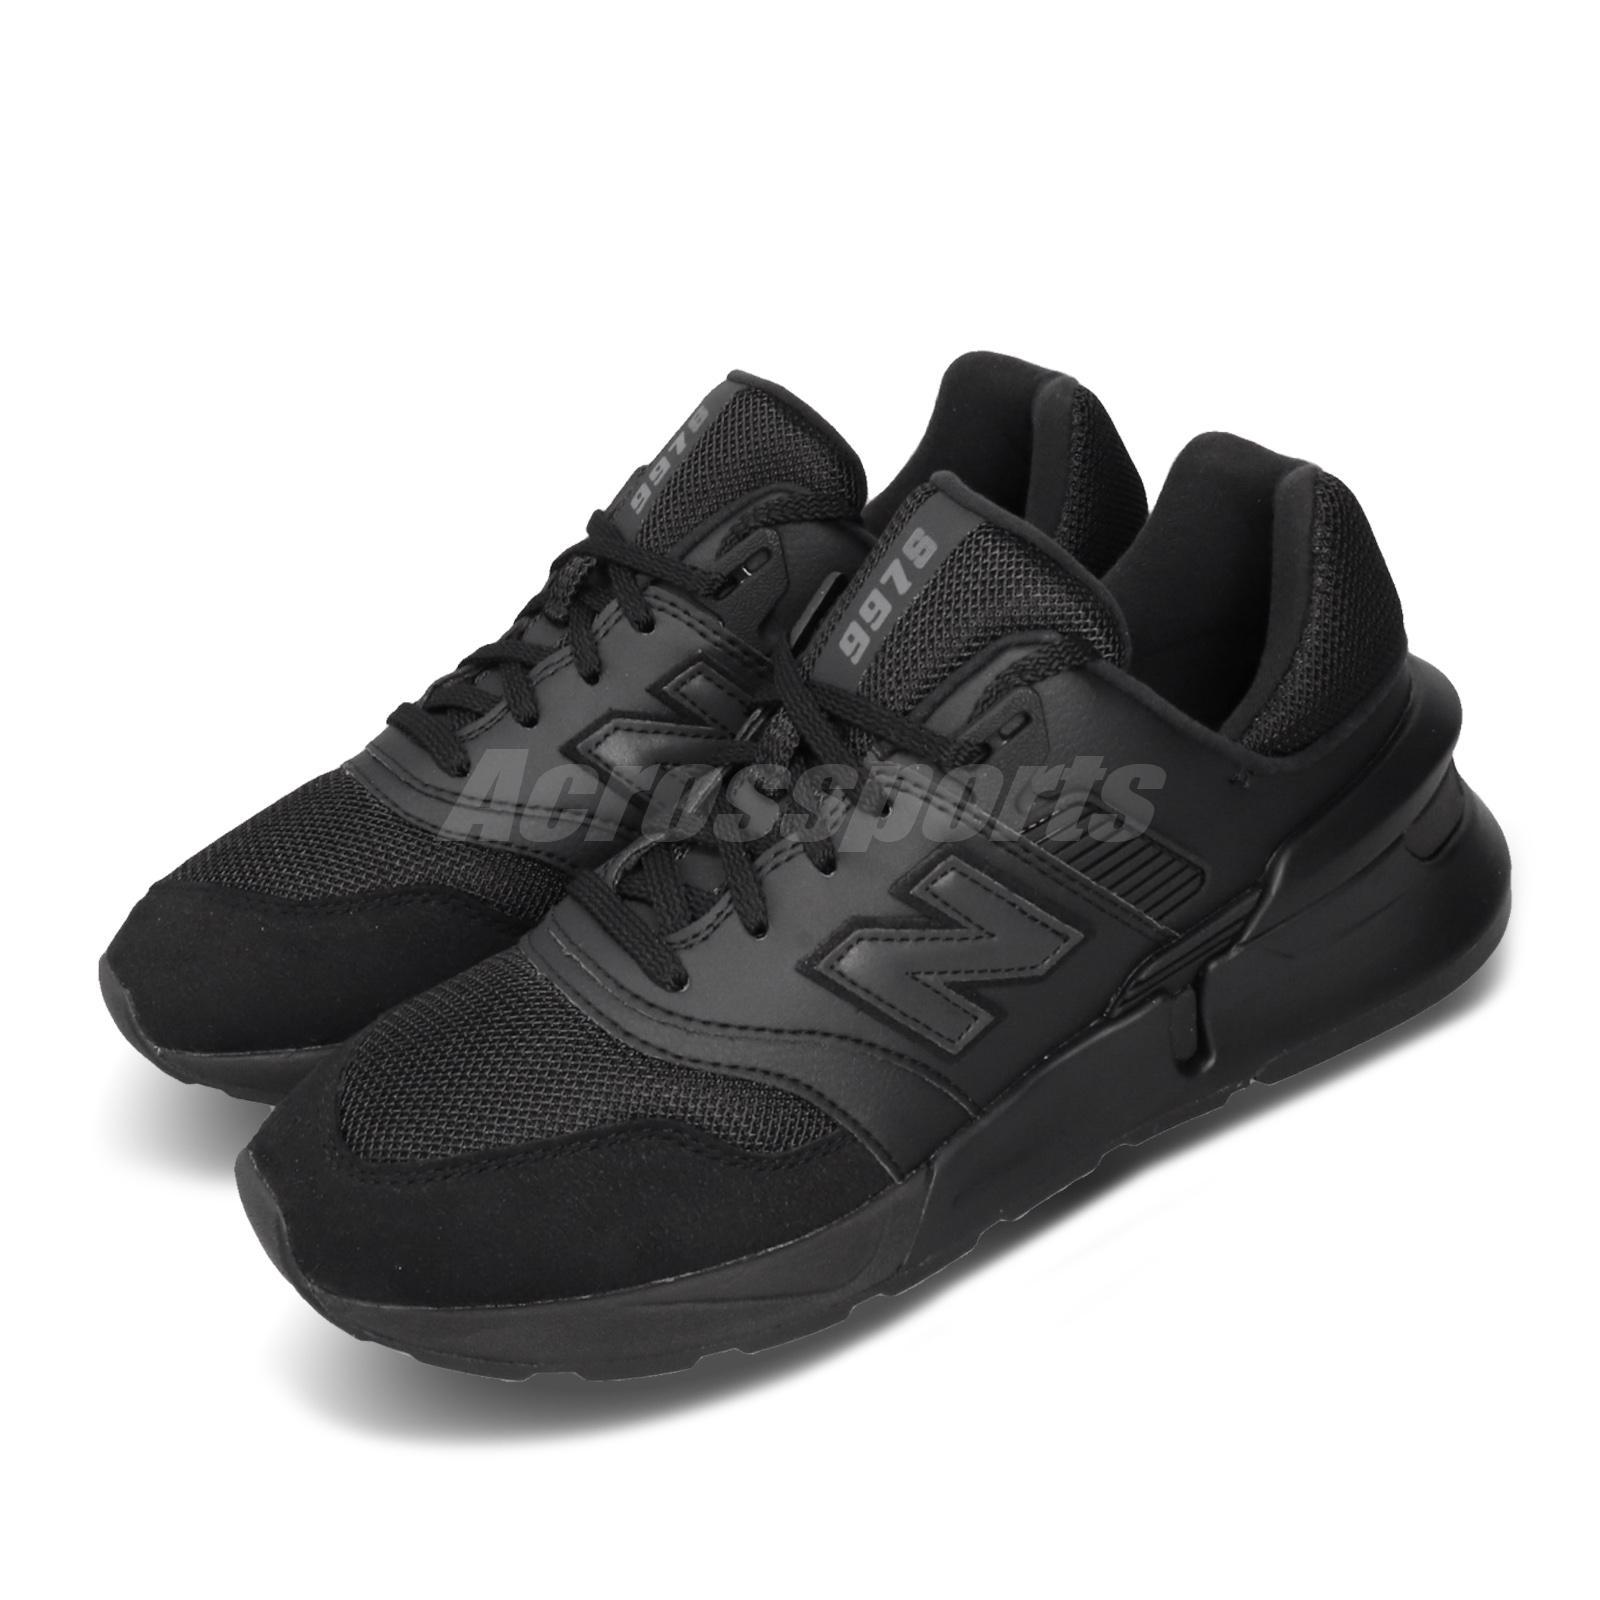 new balance 997s black